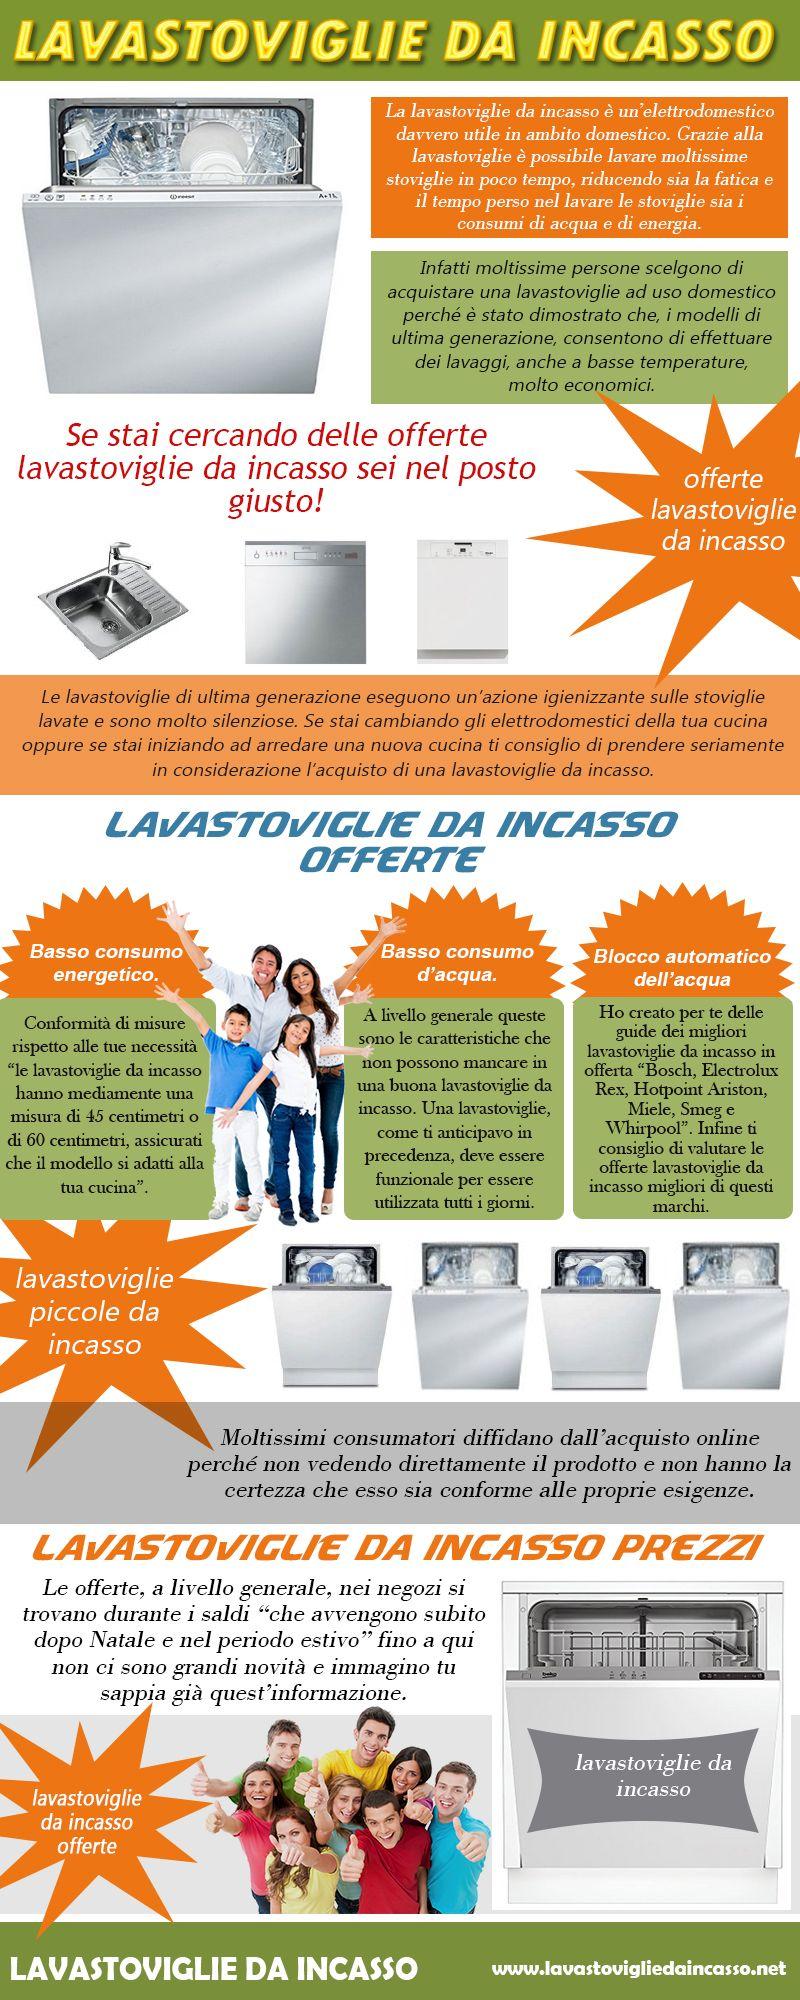 Pin di lavastoviglie incasso su lavastoviglie da incasso | Pinterest